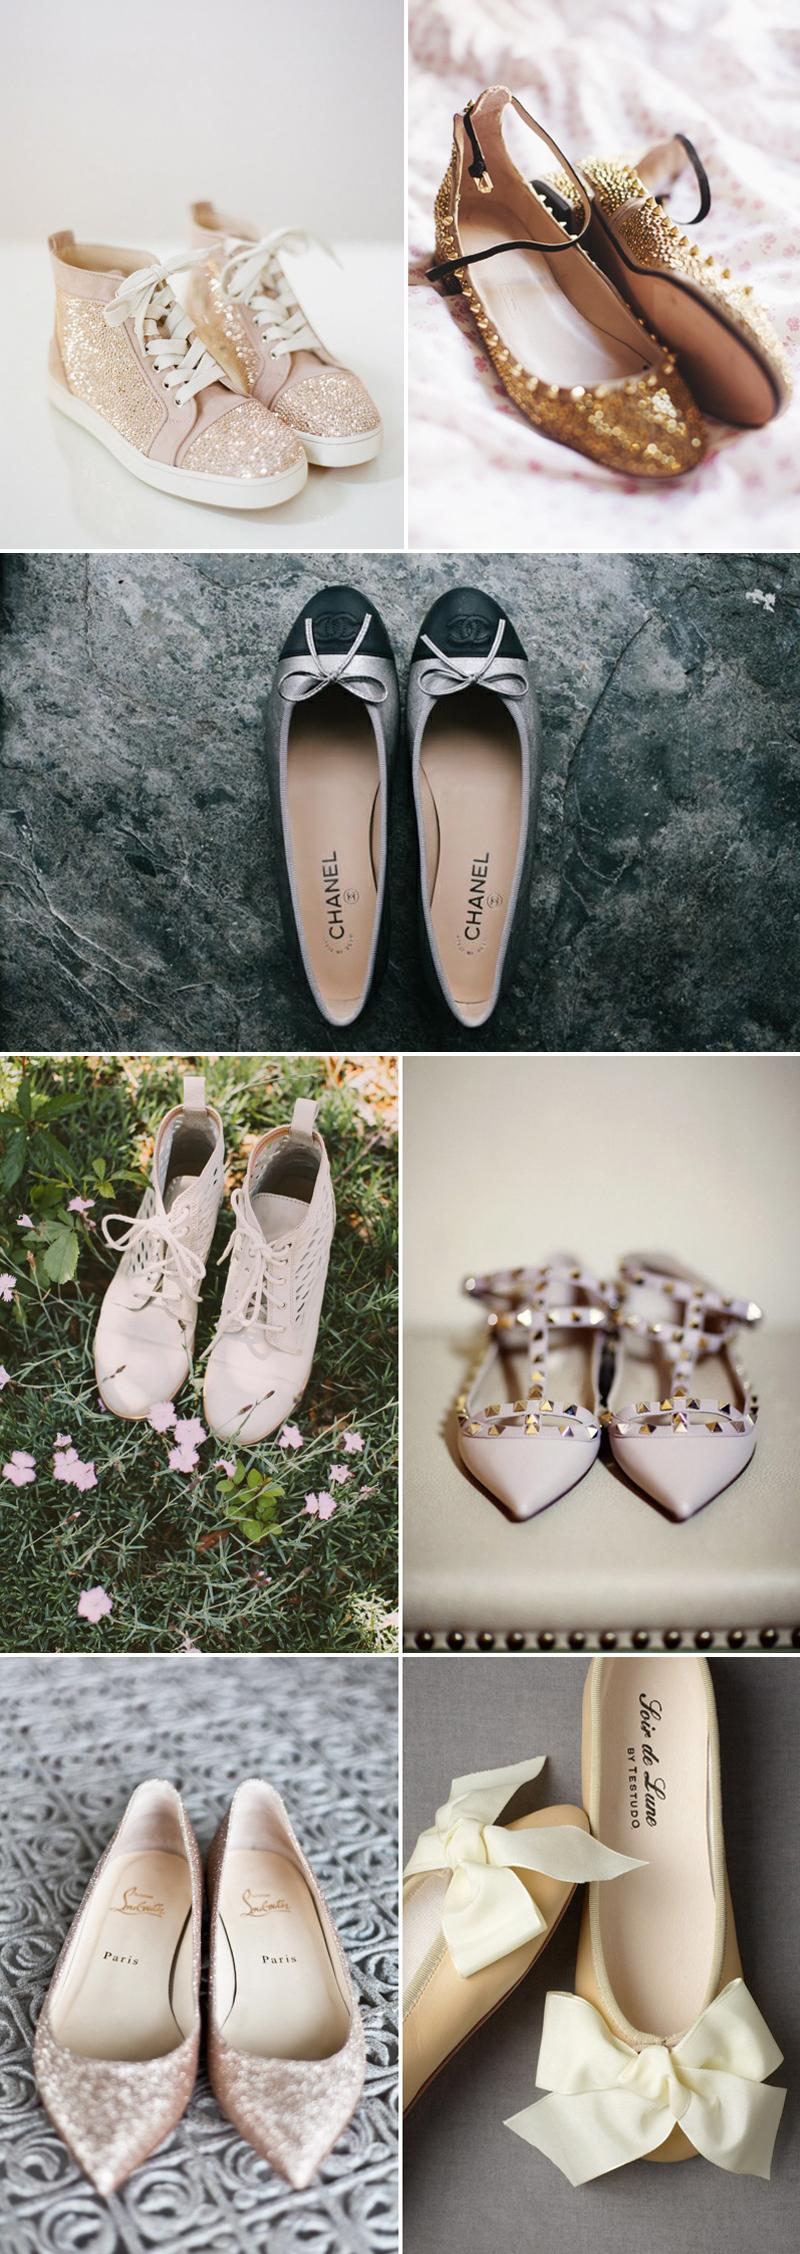 Coco Wedding Venues - Pinterest Peek - The Shoe.